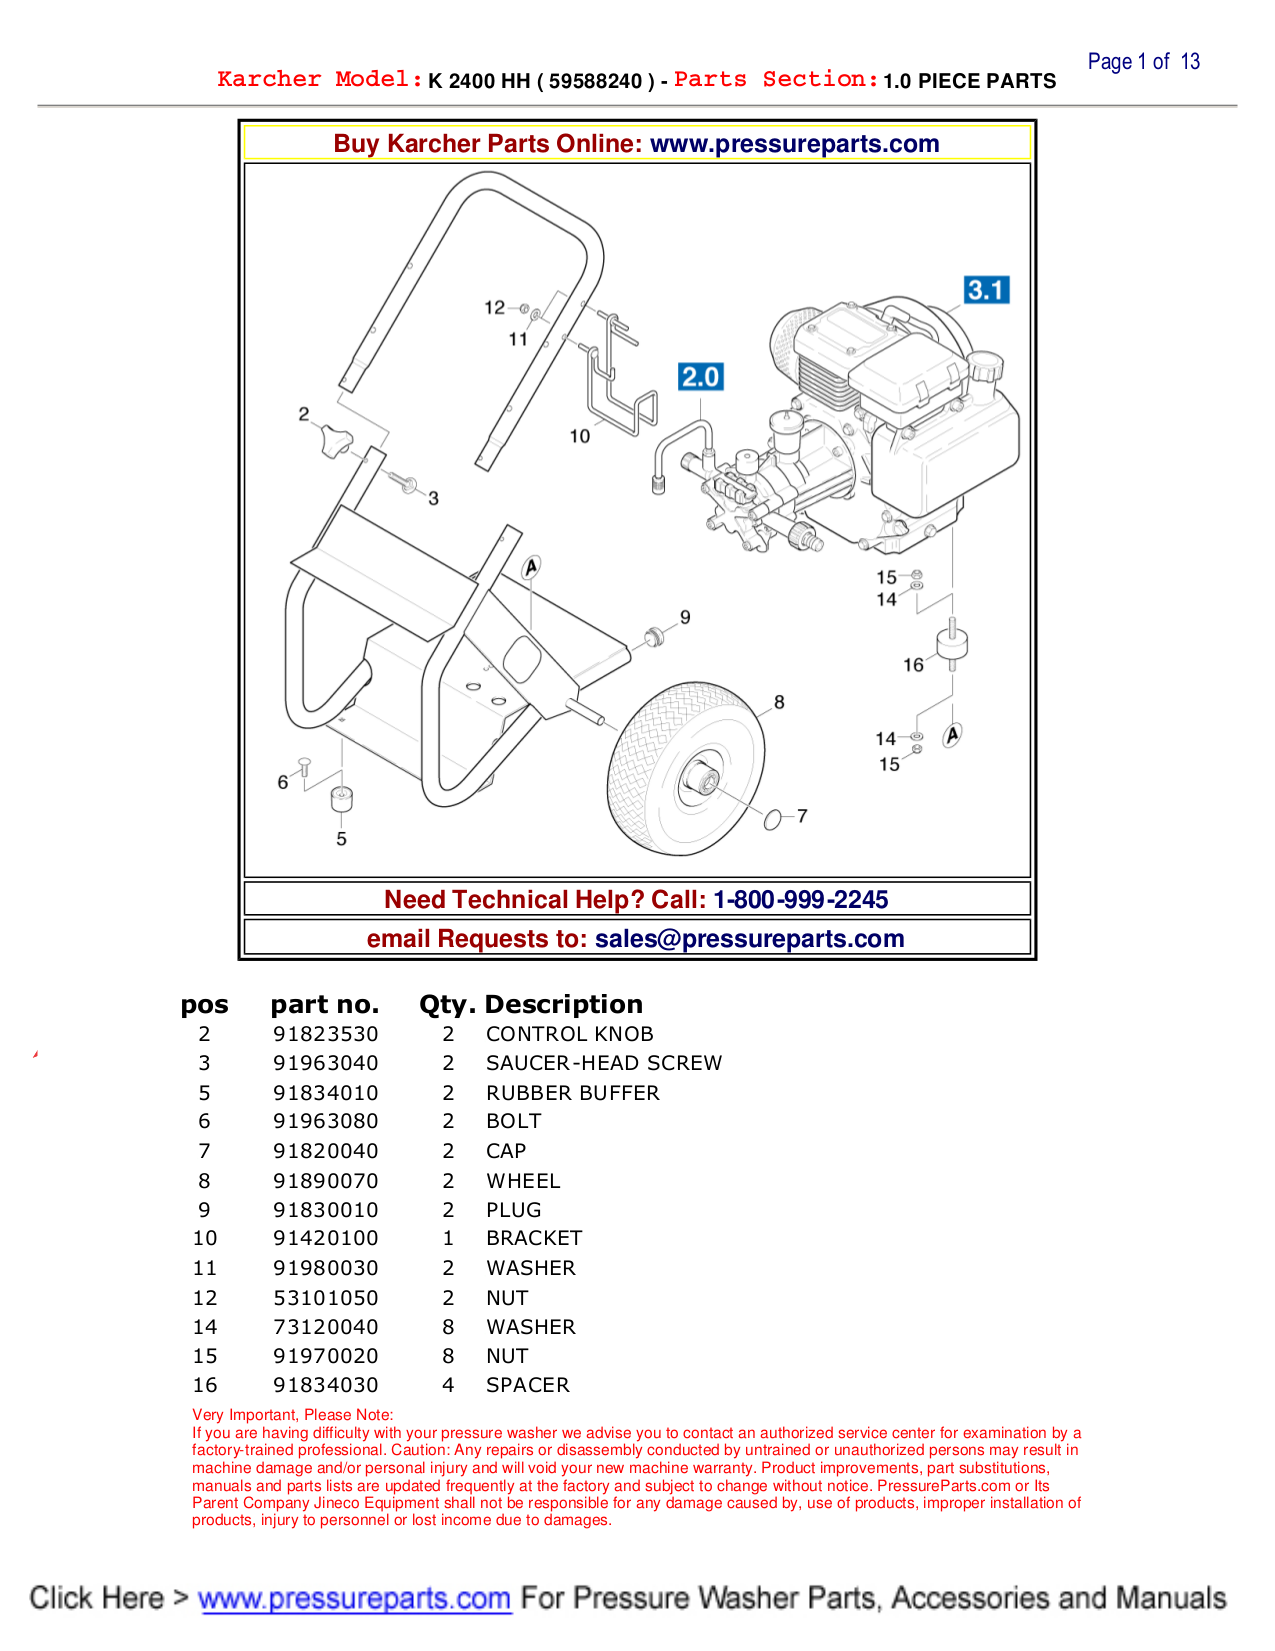 Download Free Pdf For Karcher K 2400 Hh Pressure Washers